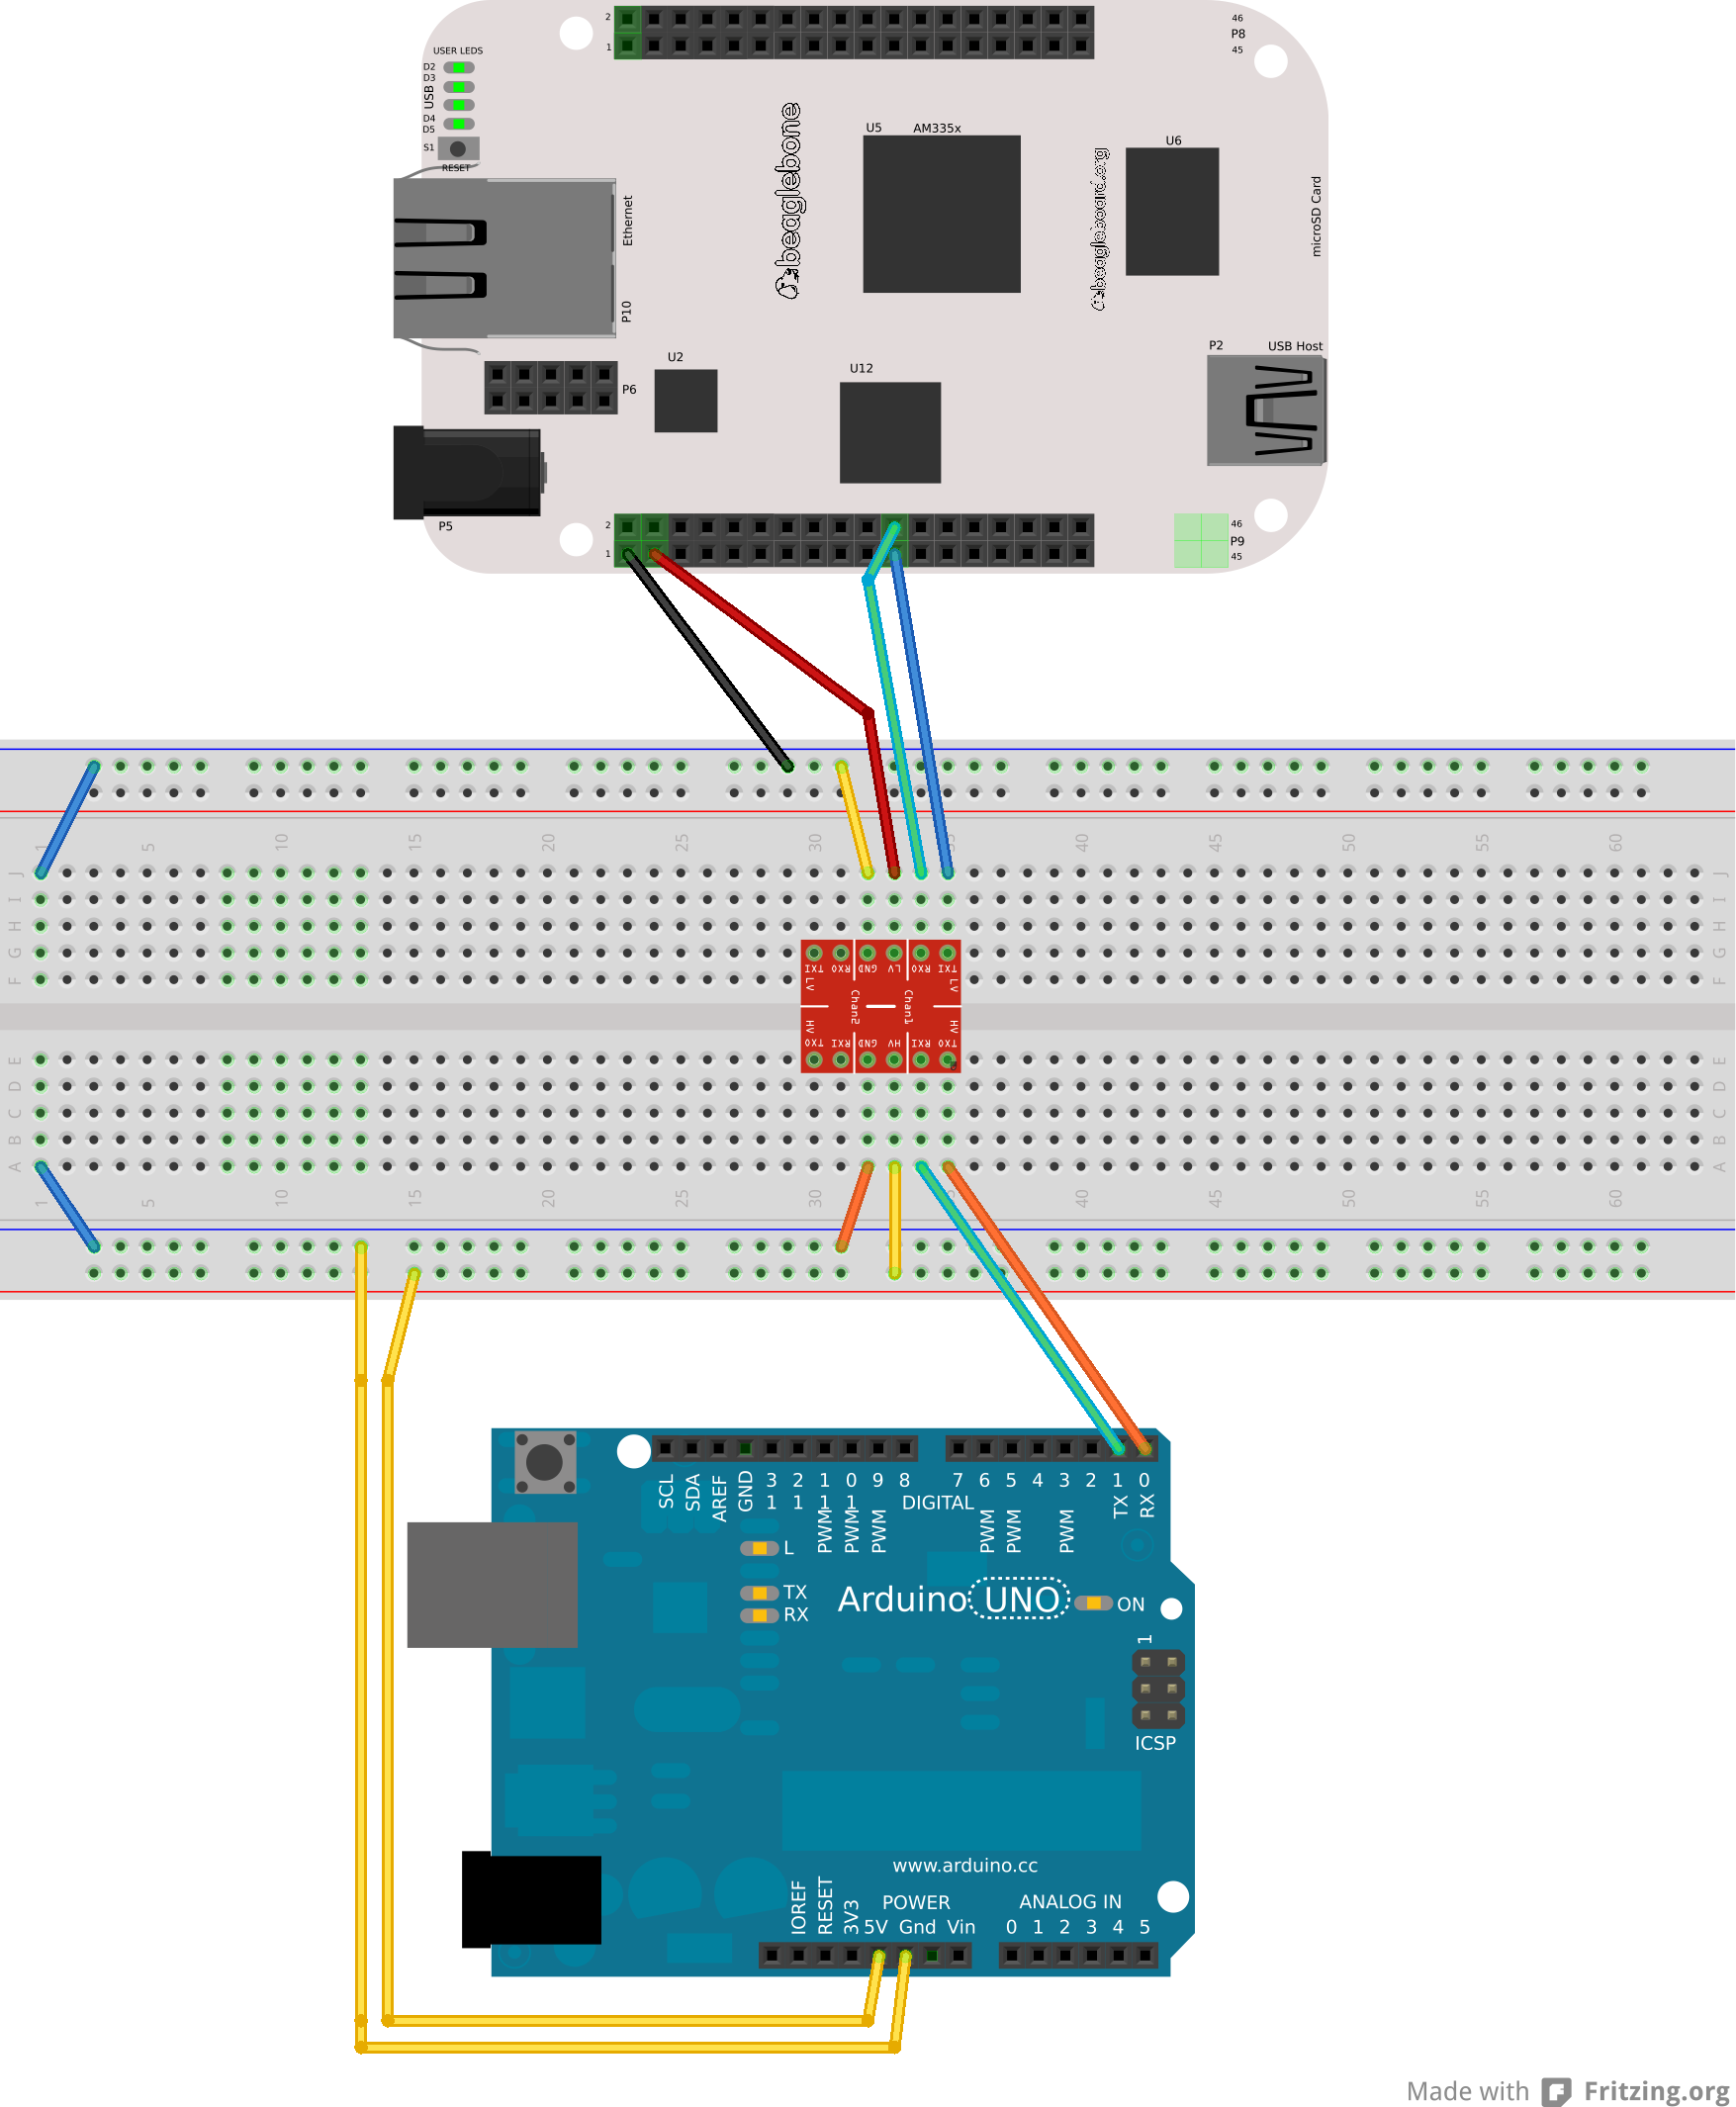 How to make a BeagleBone and an Arduino communicate